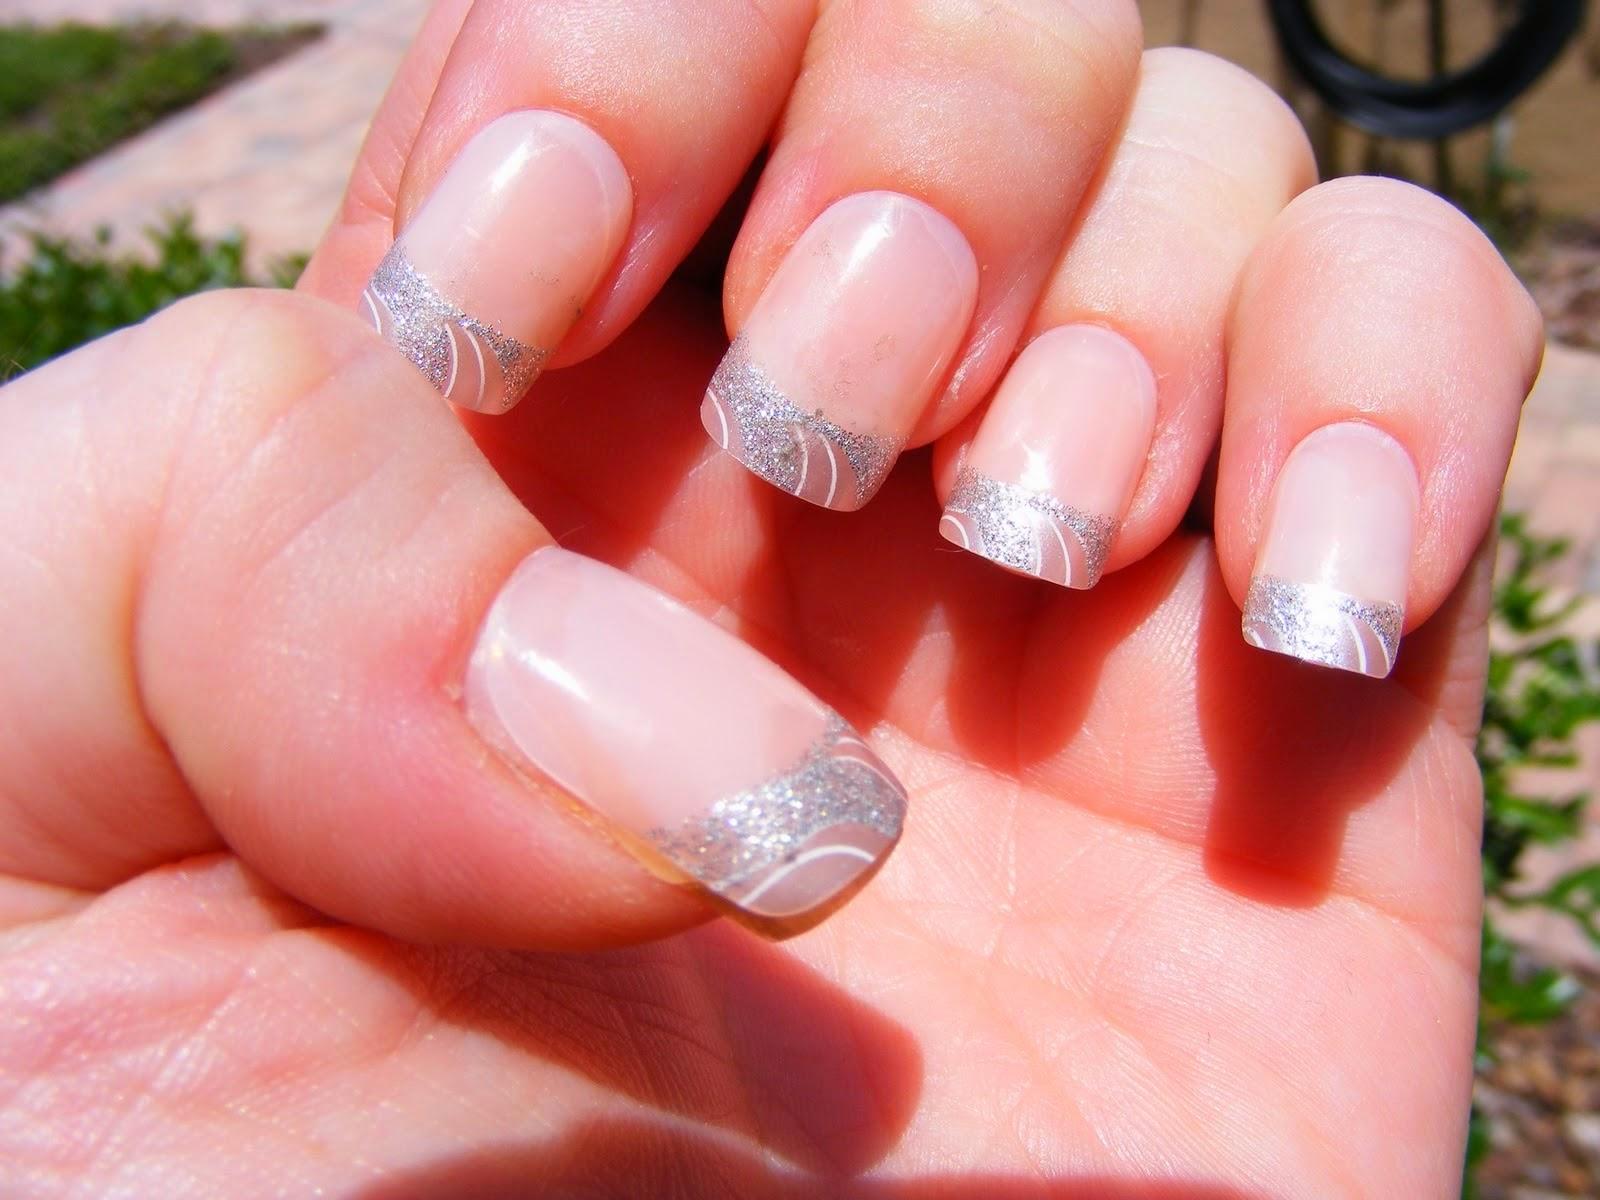 Full color nail art - Best Light Pink Nail Design